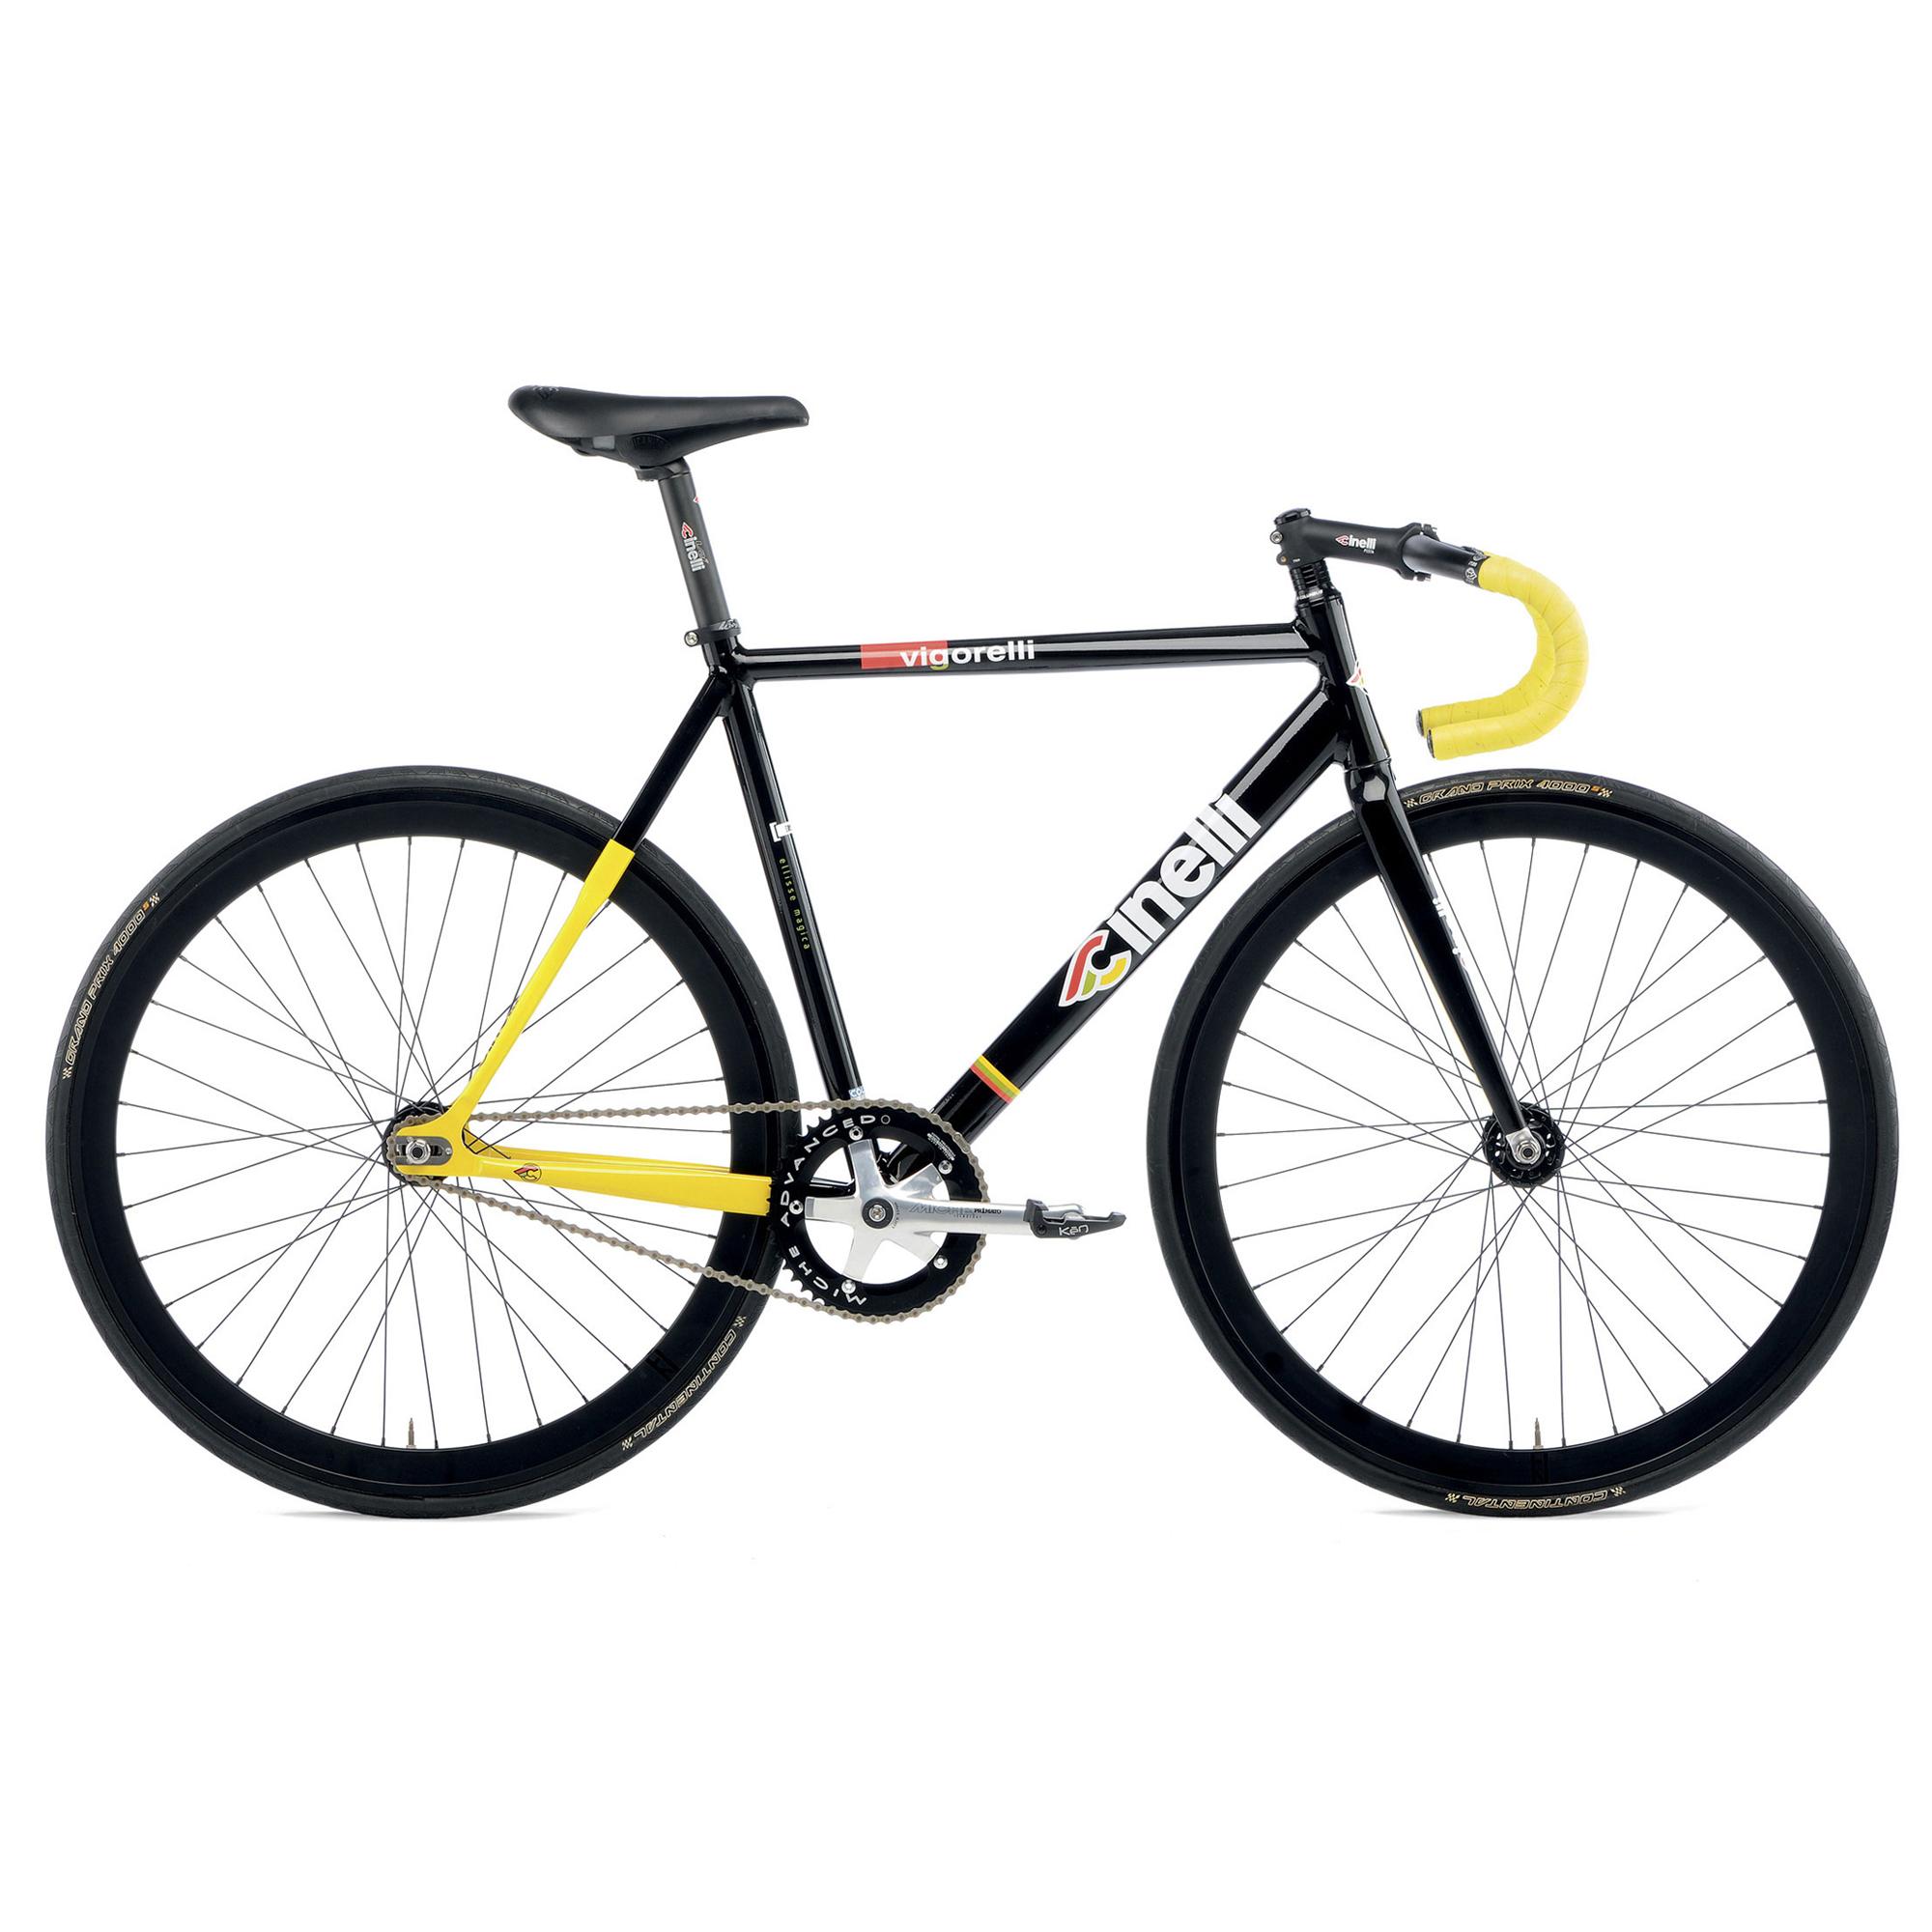 Cinelli Vigorelli Black Single Speed/ Track Bike - Buy Online ...